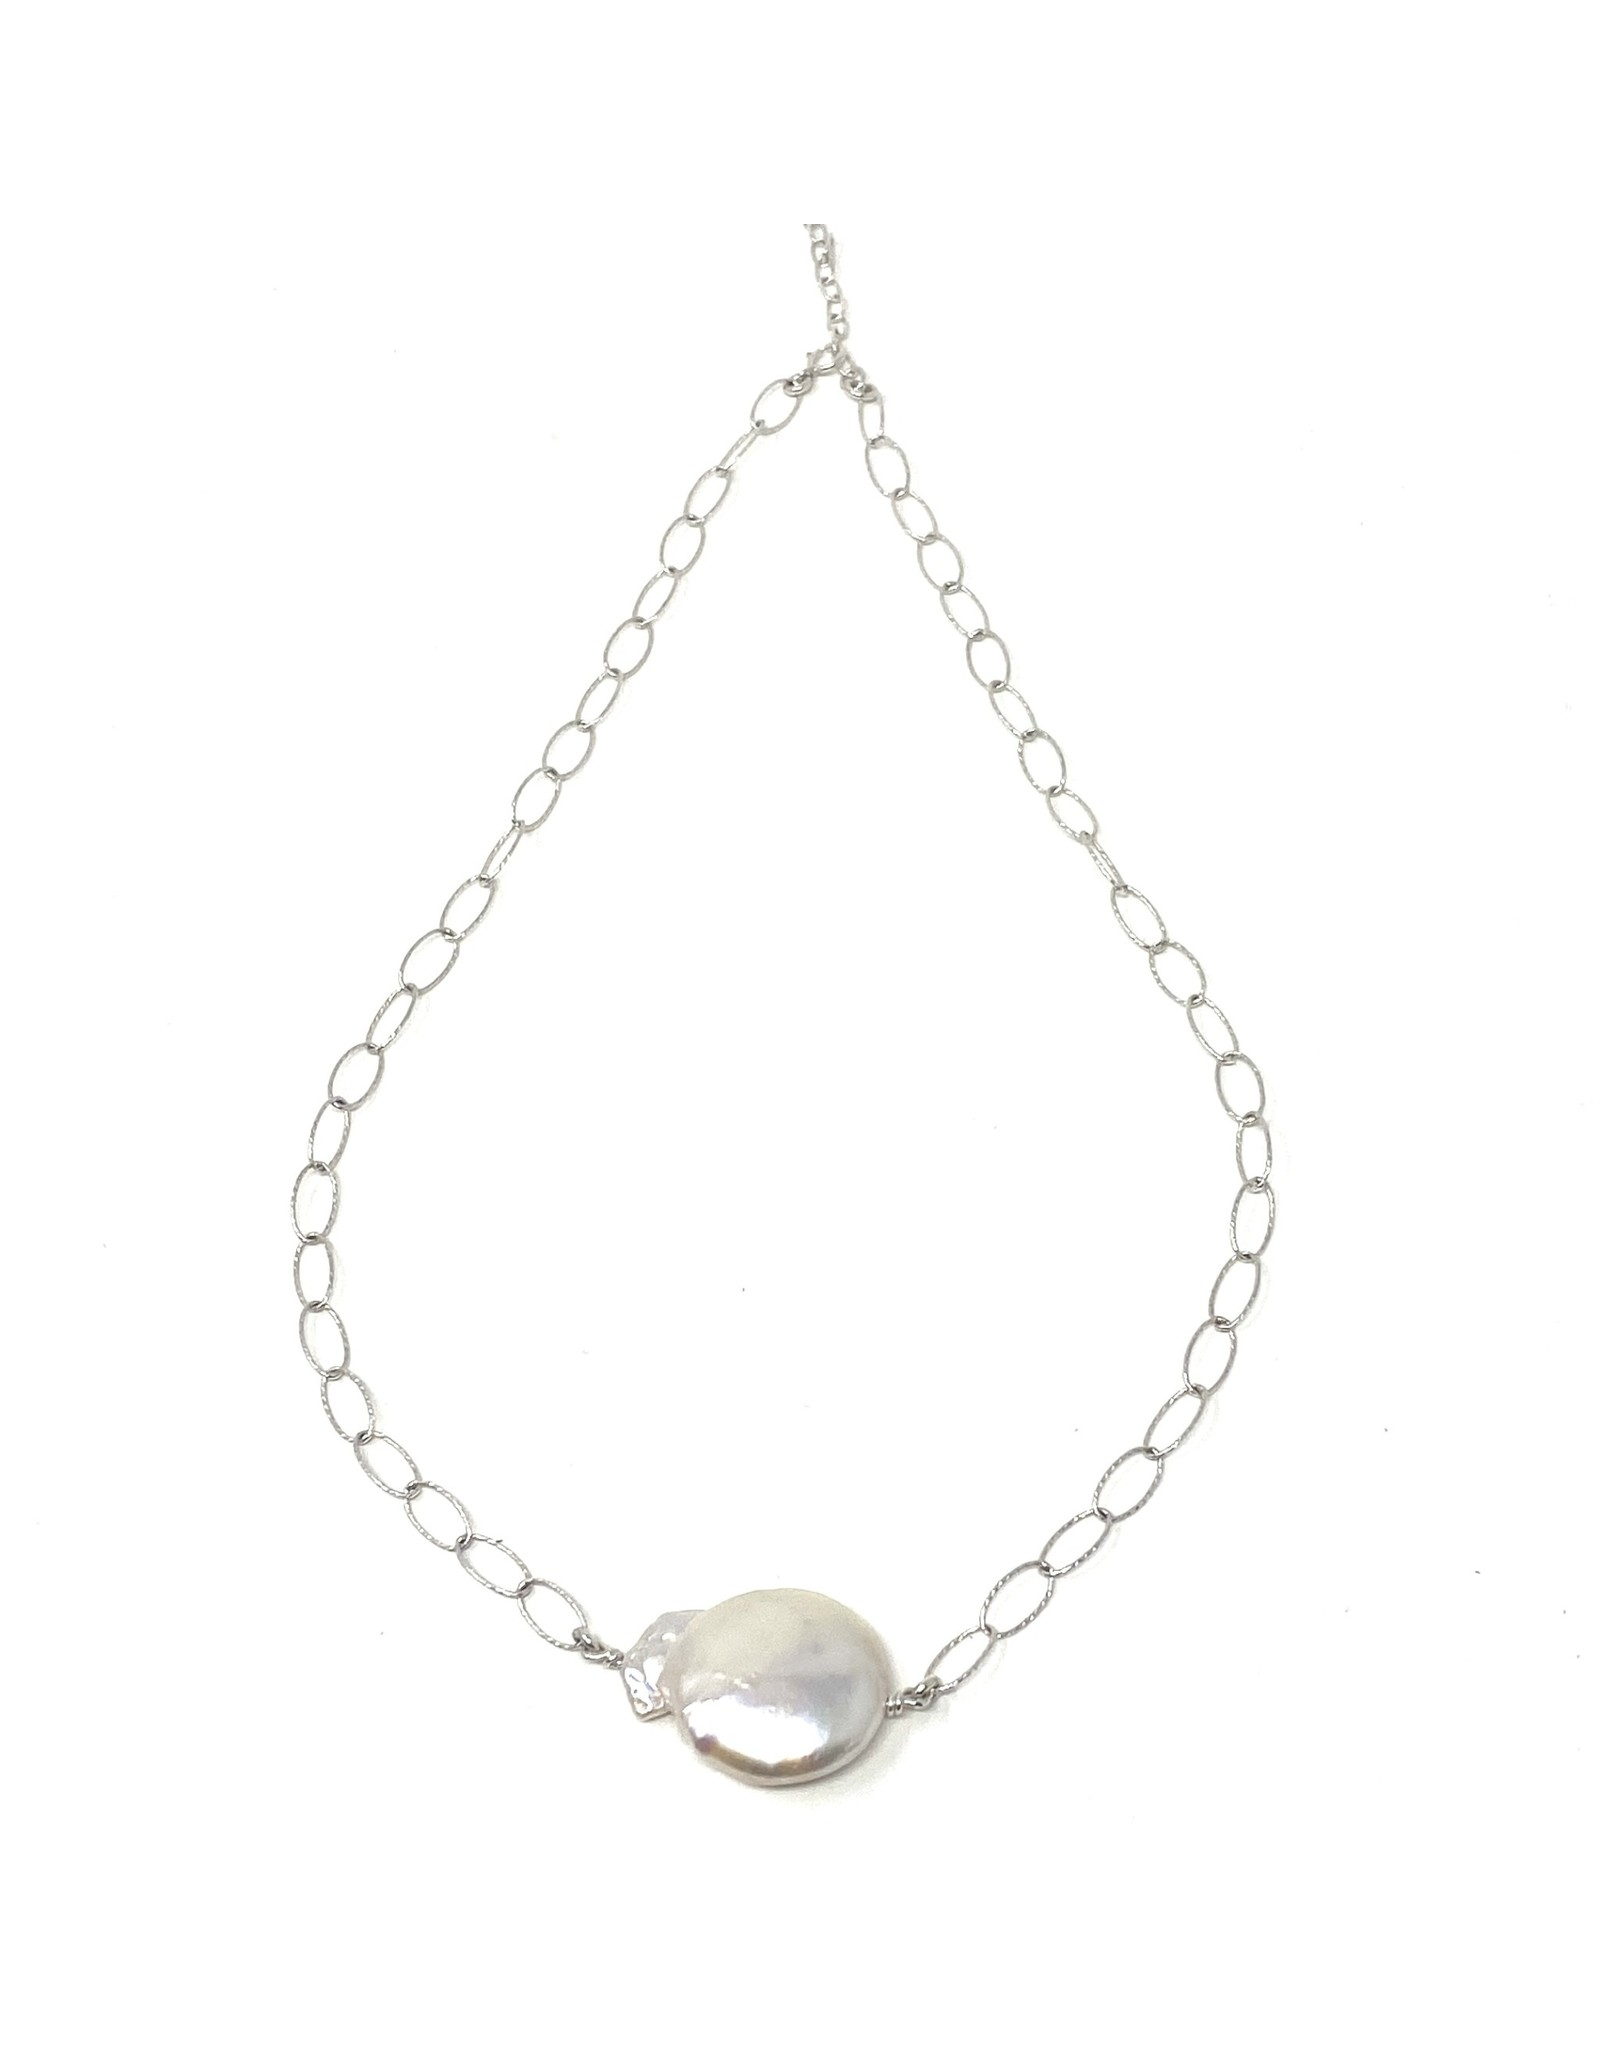 Large Keshi Pearl on Dia Cut Chain